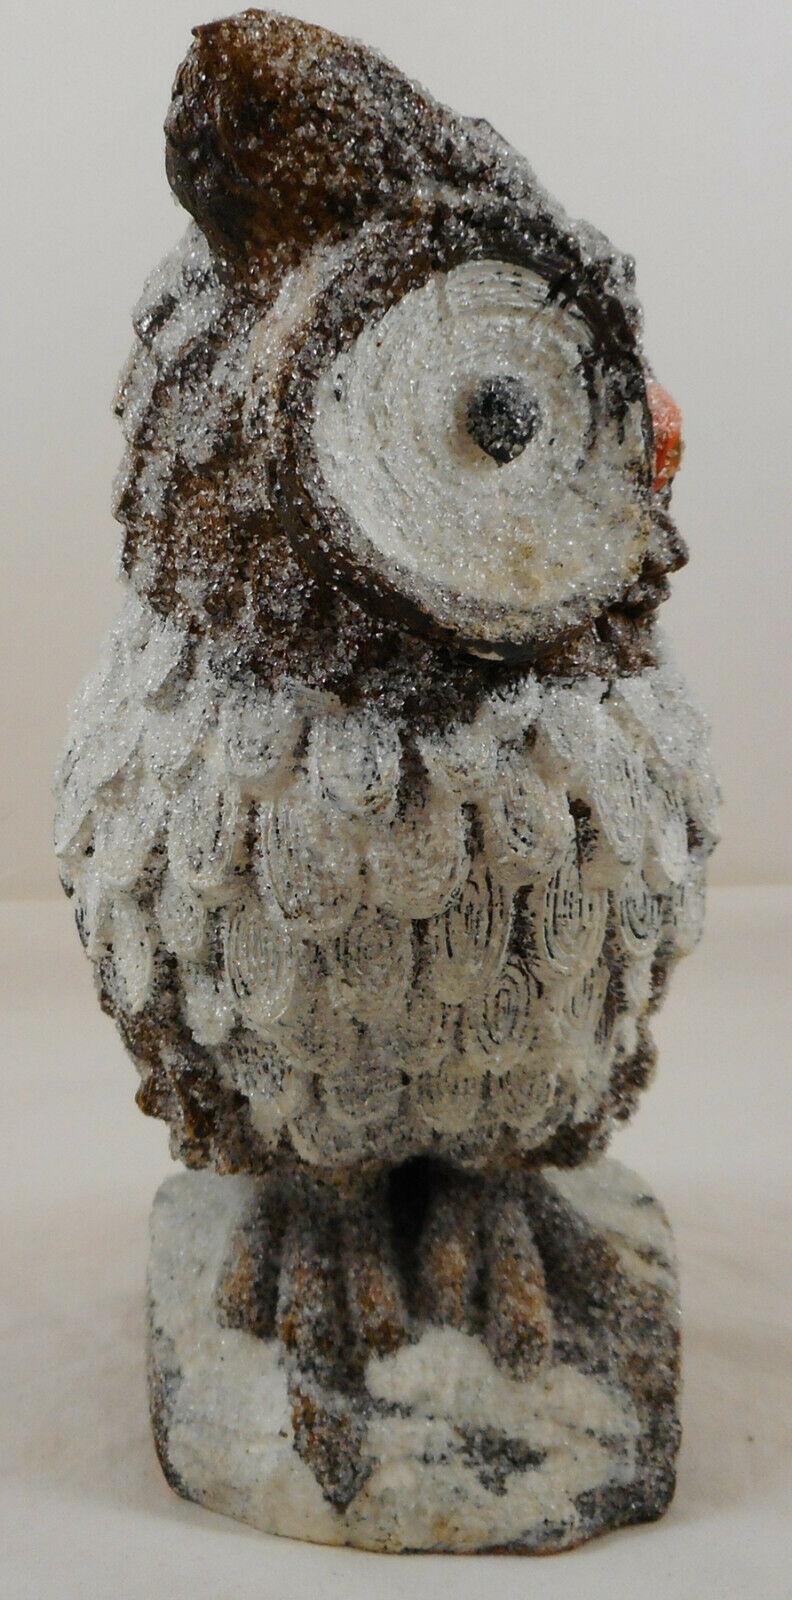 "Brown Owl On Stump Statue Figurine 8"" Glittery Glitter Resin"